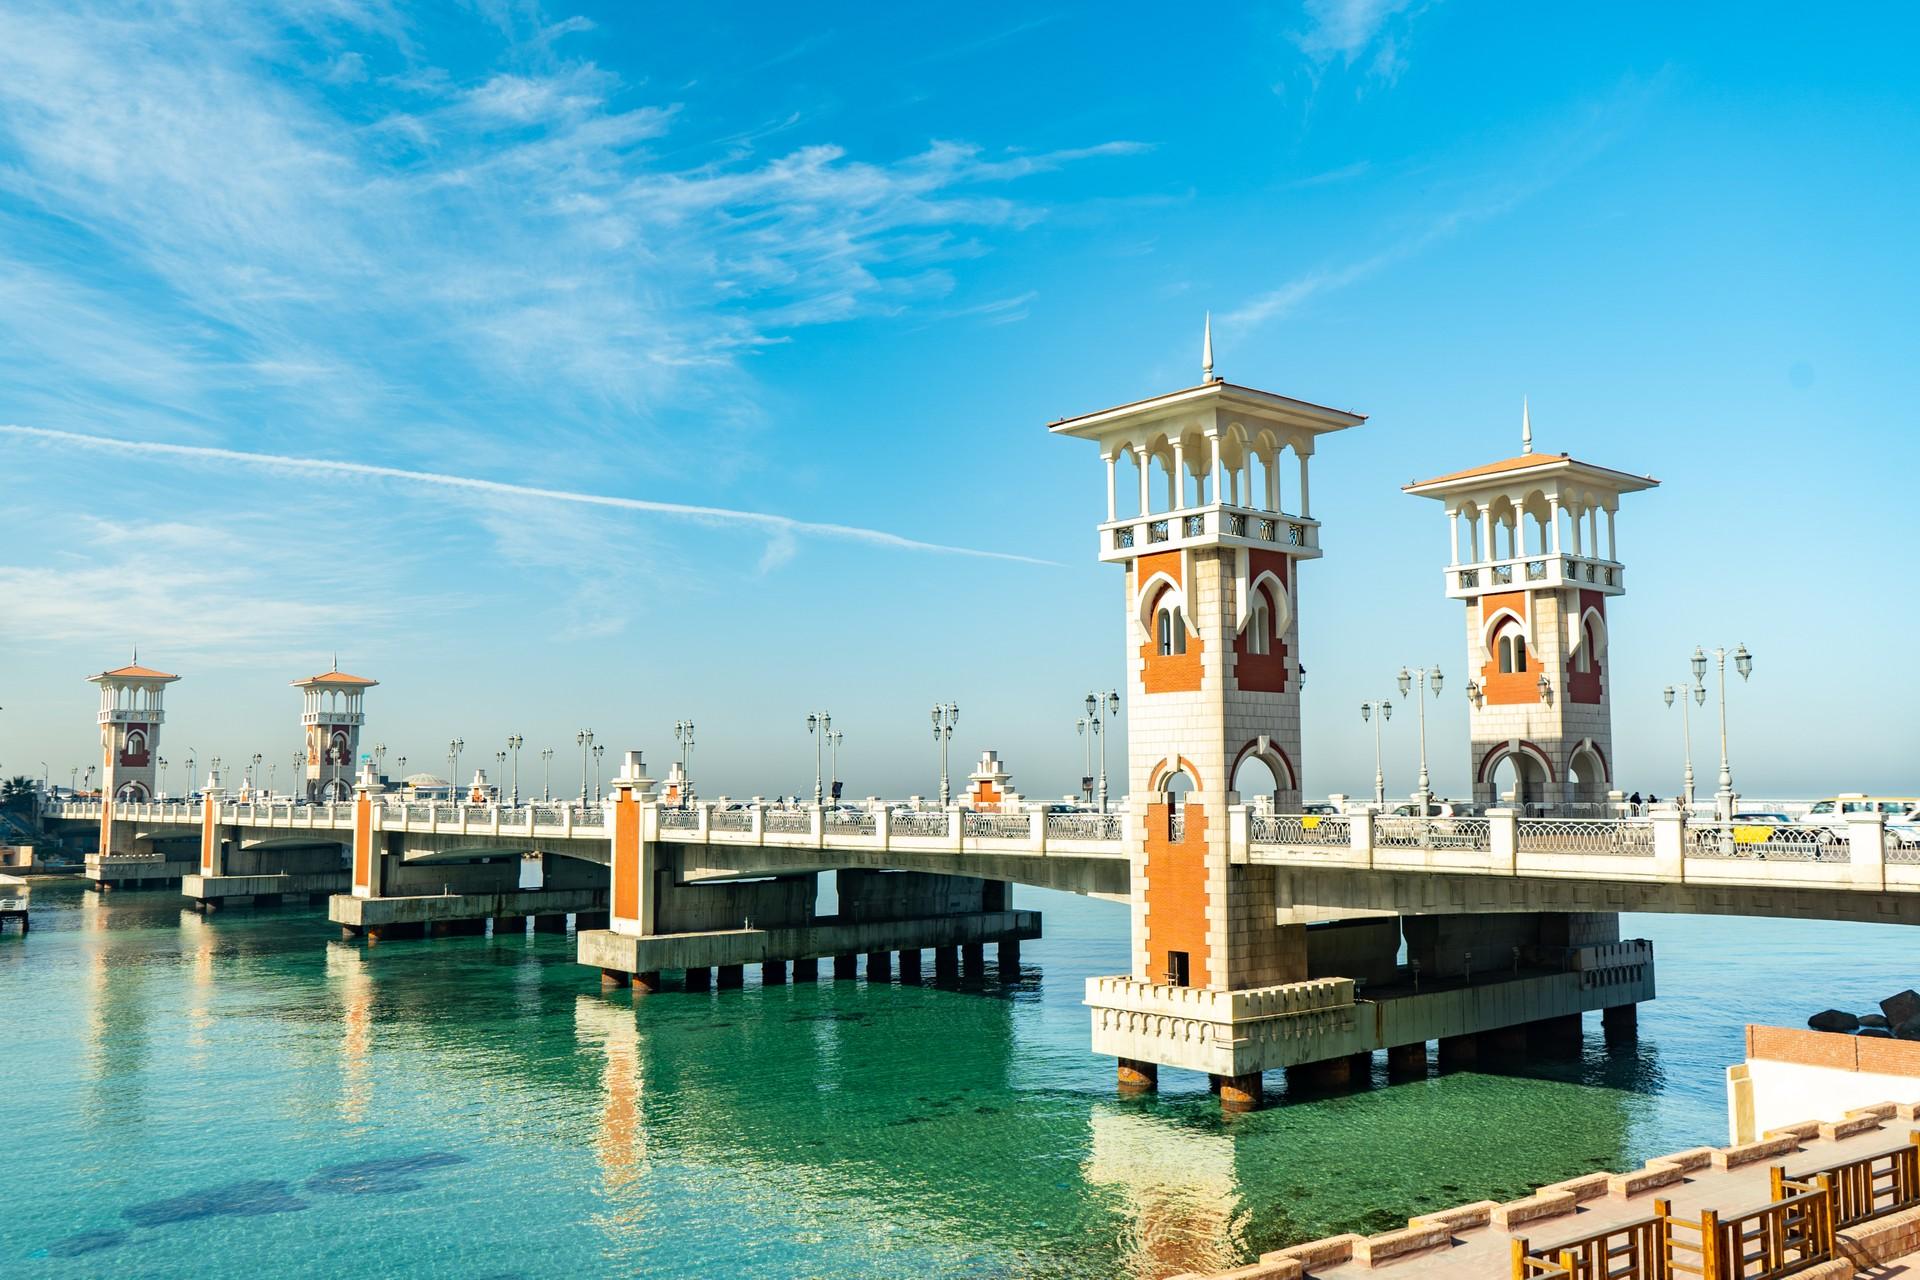 Stanley Bridge in Alexandria, Egypt